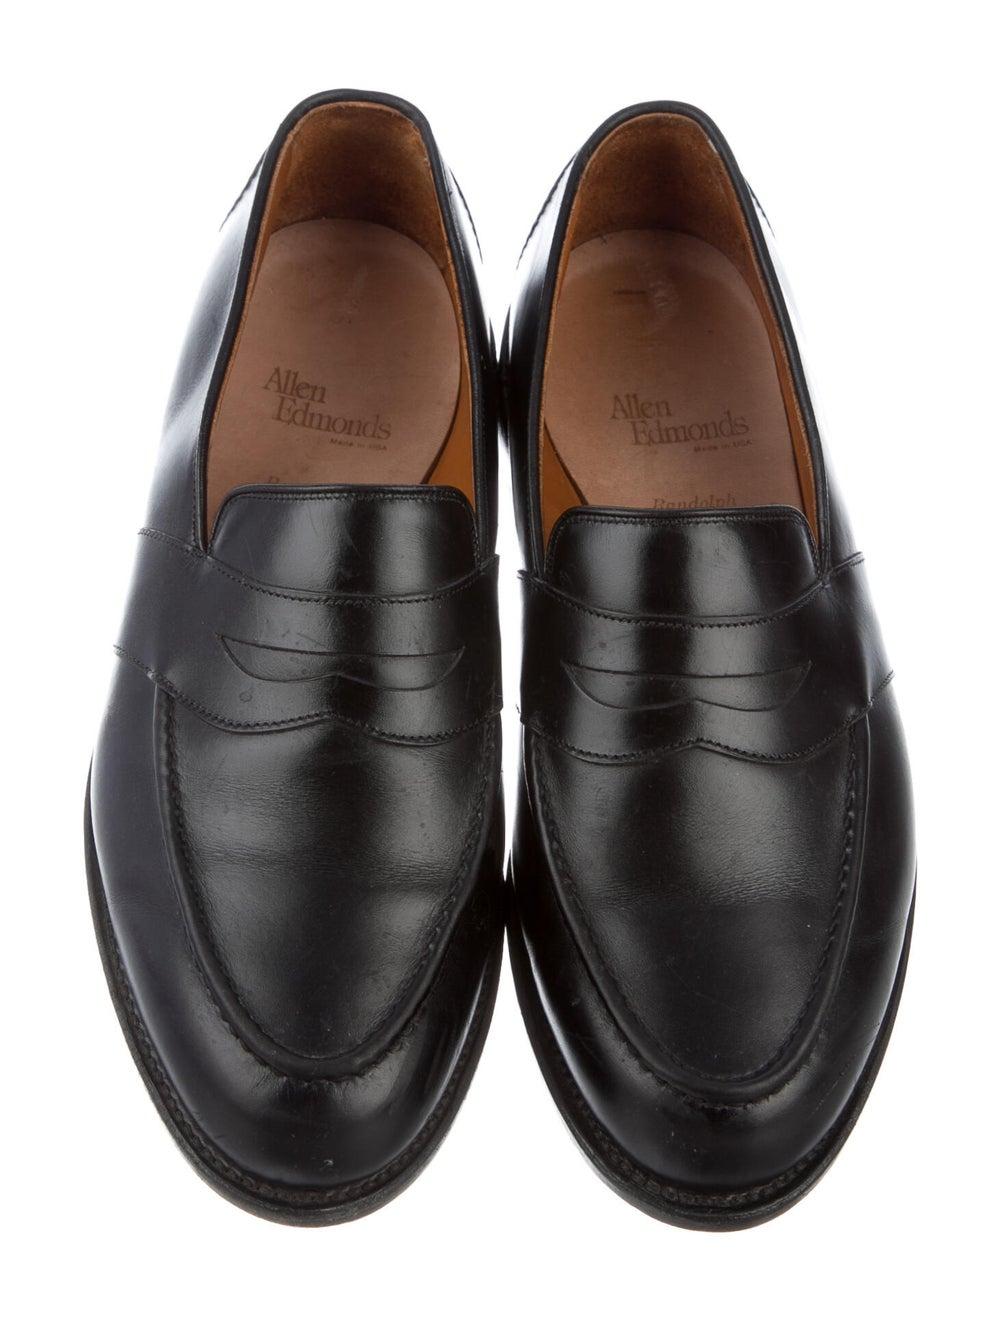 Allen Edmonds Leather Penny Loafers black - image 3